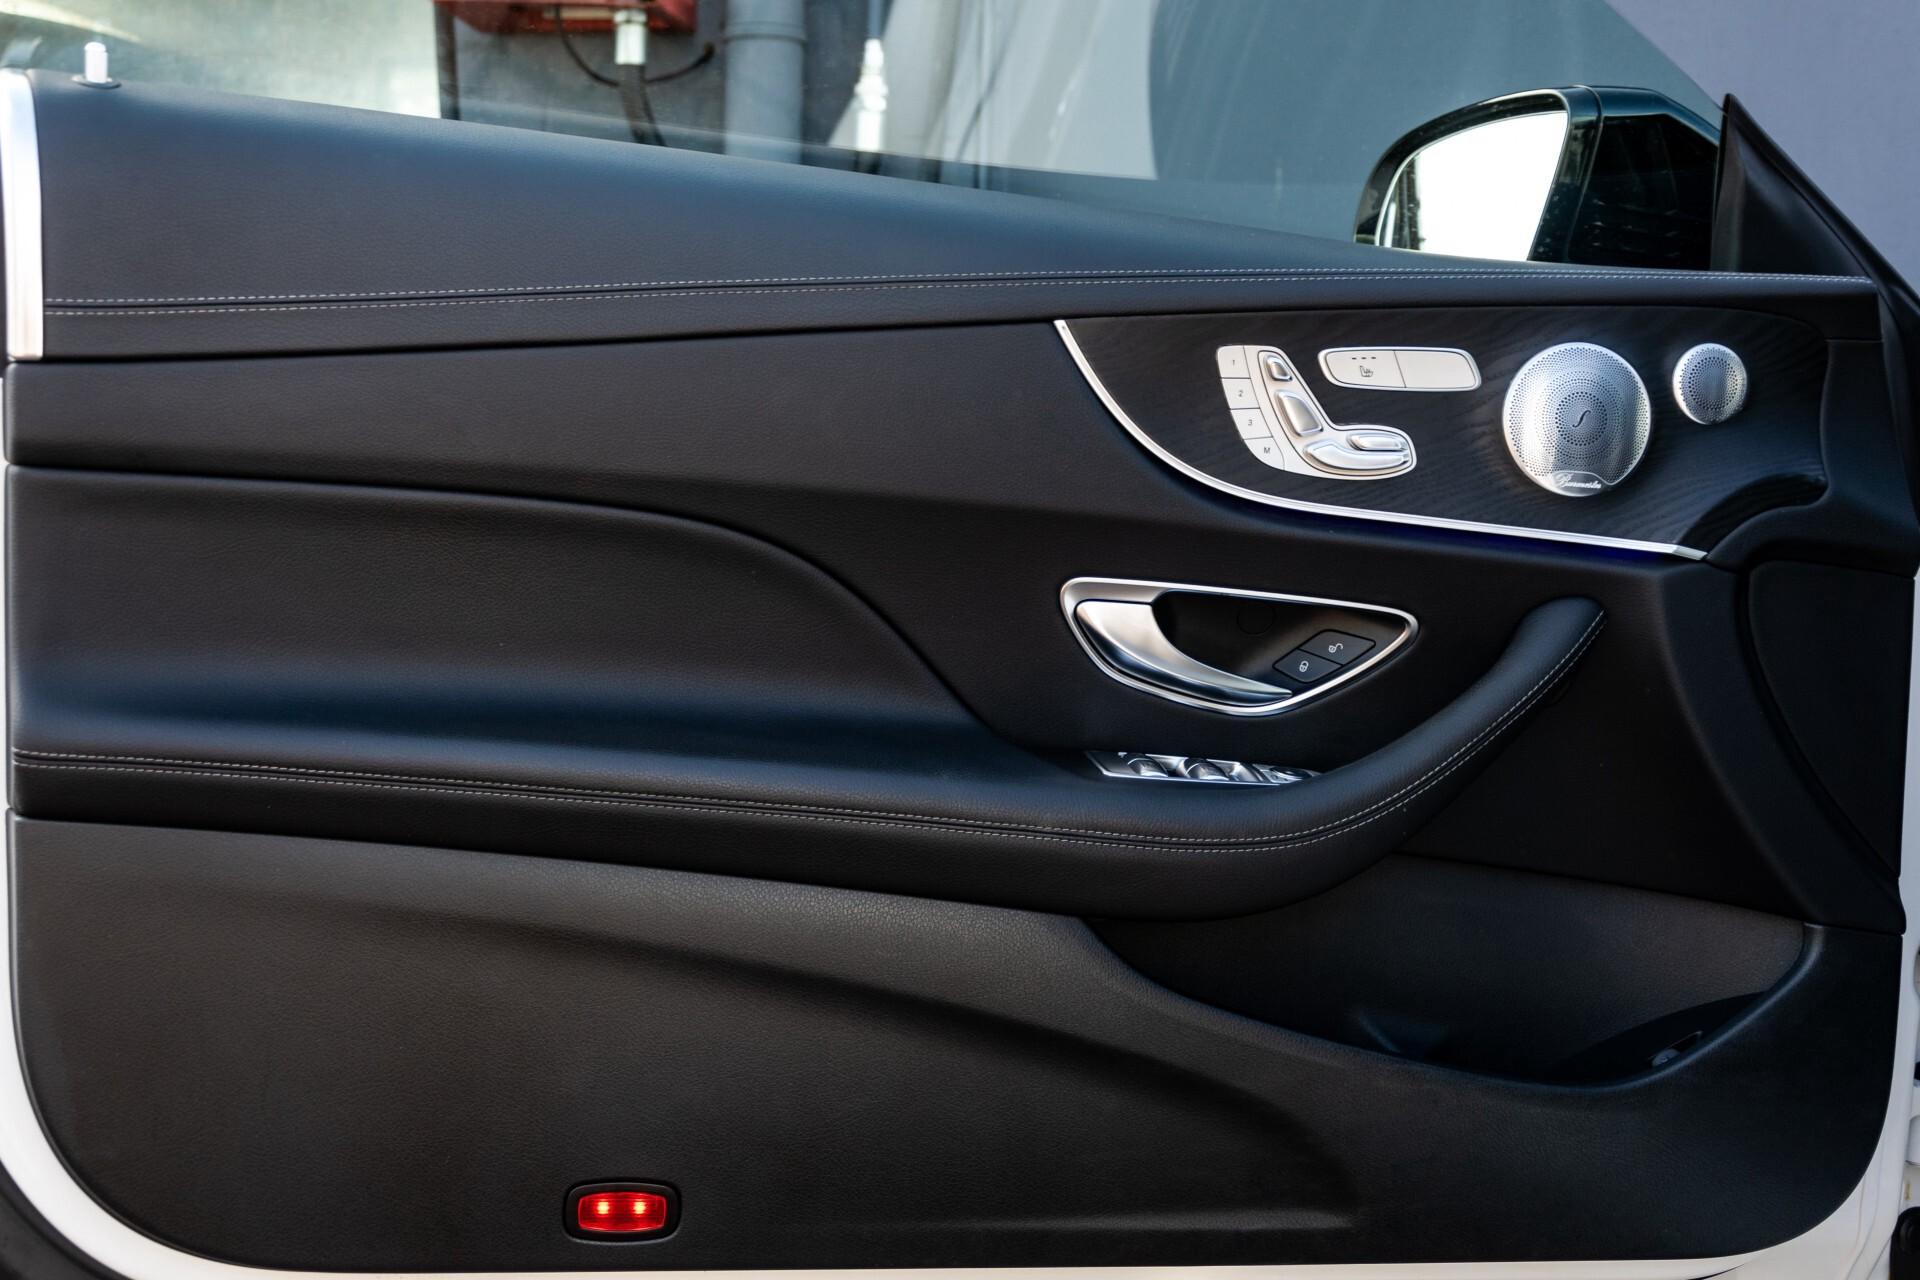 Mercedes-Benz E-Klasse Coupé 300 AMG Panorama/Rij-assist/Keyless/Massage/Memory/HUD/Standkachel/Night Aut9 Foto 30